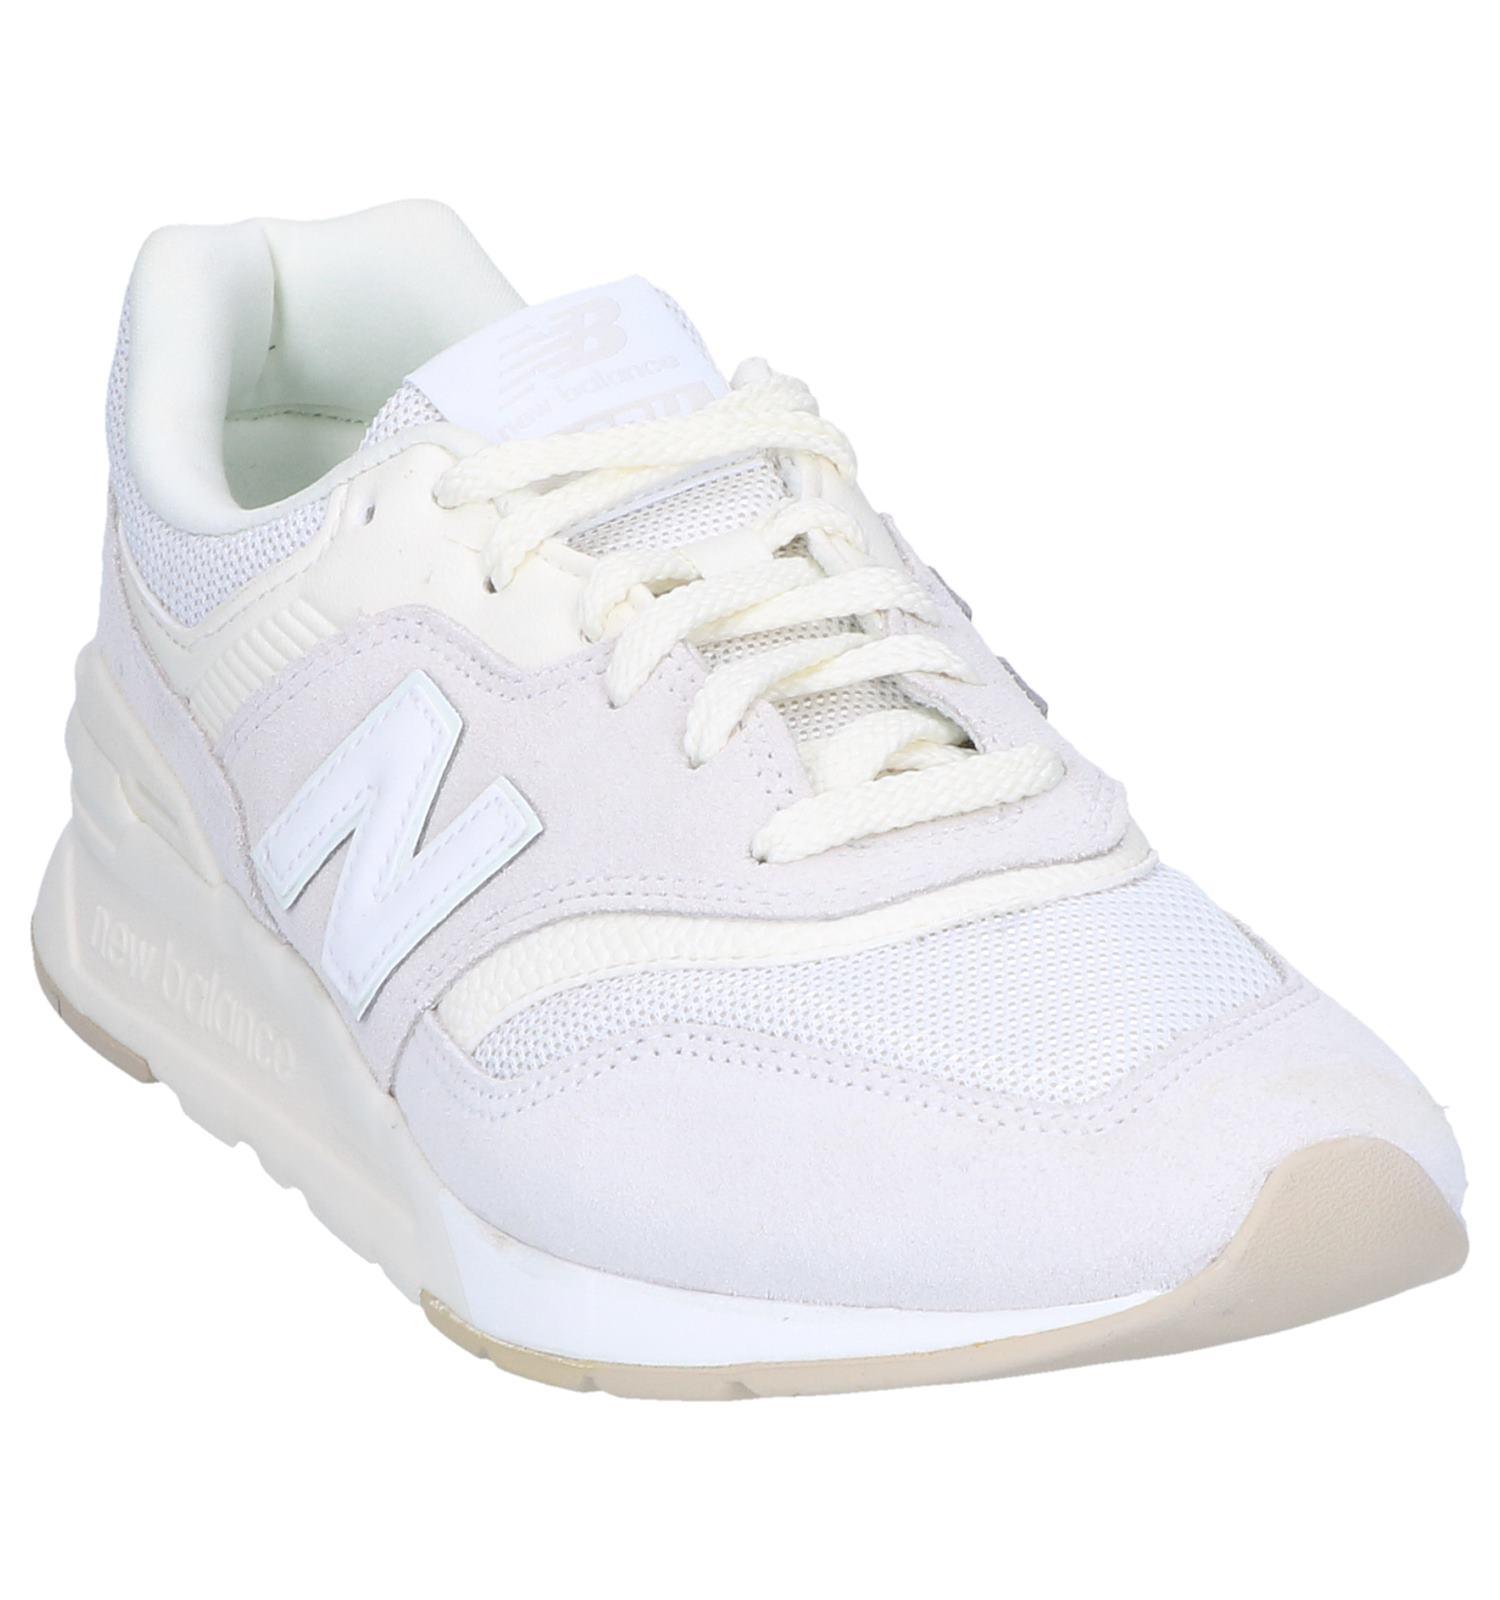 ea16ddb70d2 Lichtbeige Sneakers New Balance CM 997 | TORFS.BE | Gratis verzend en retour